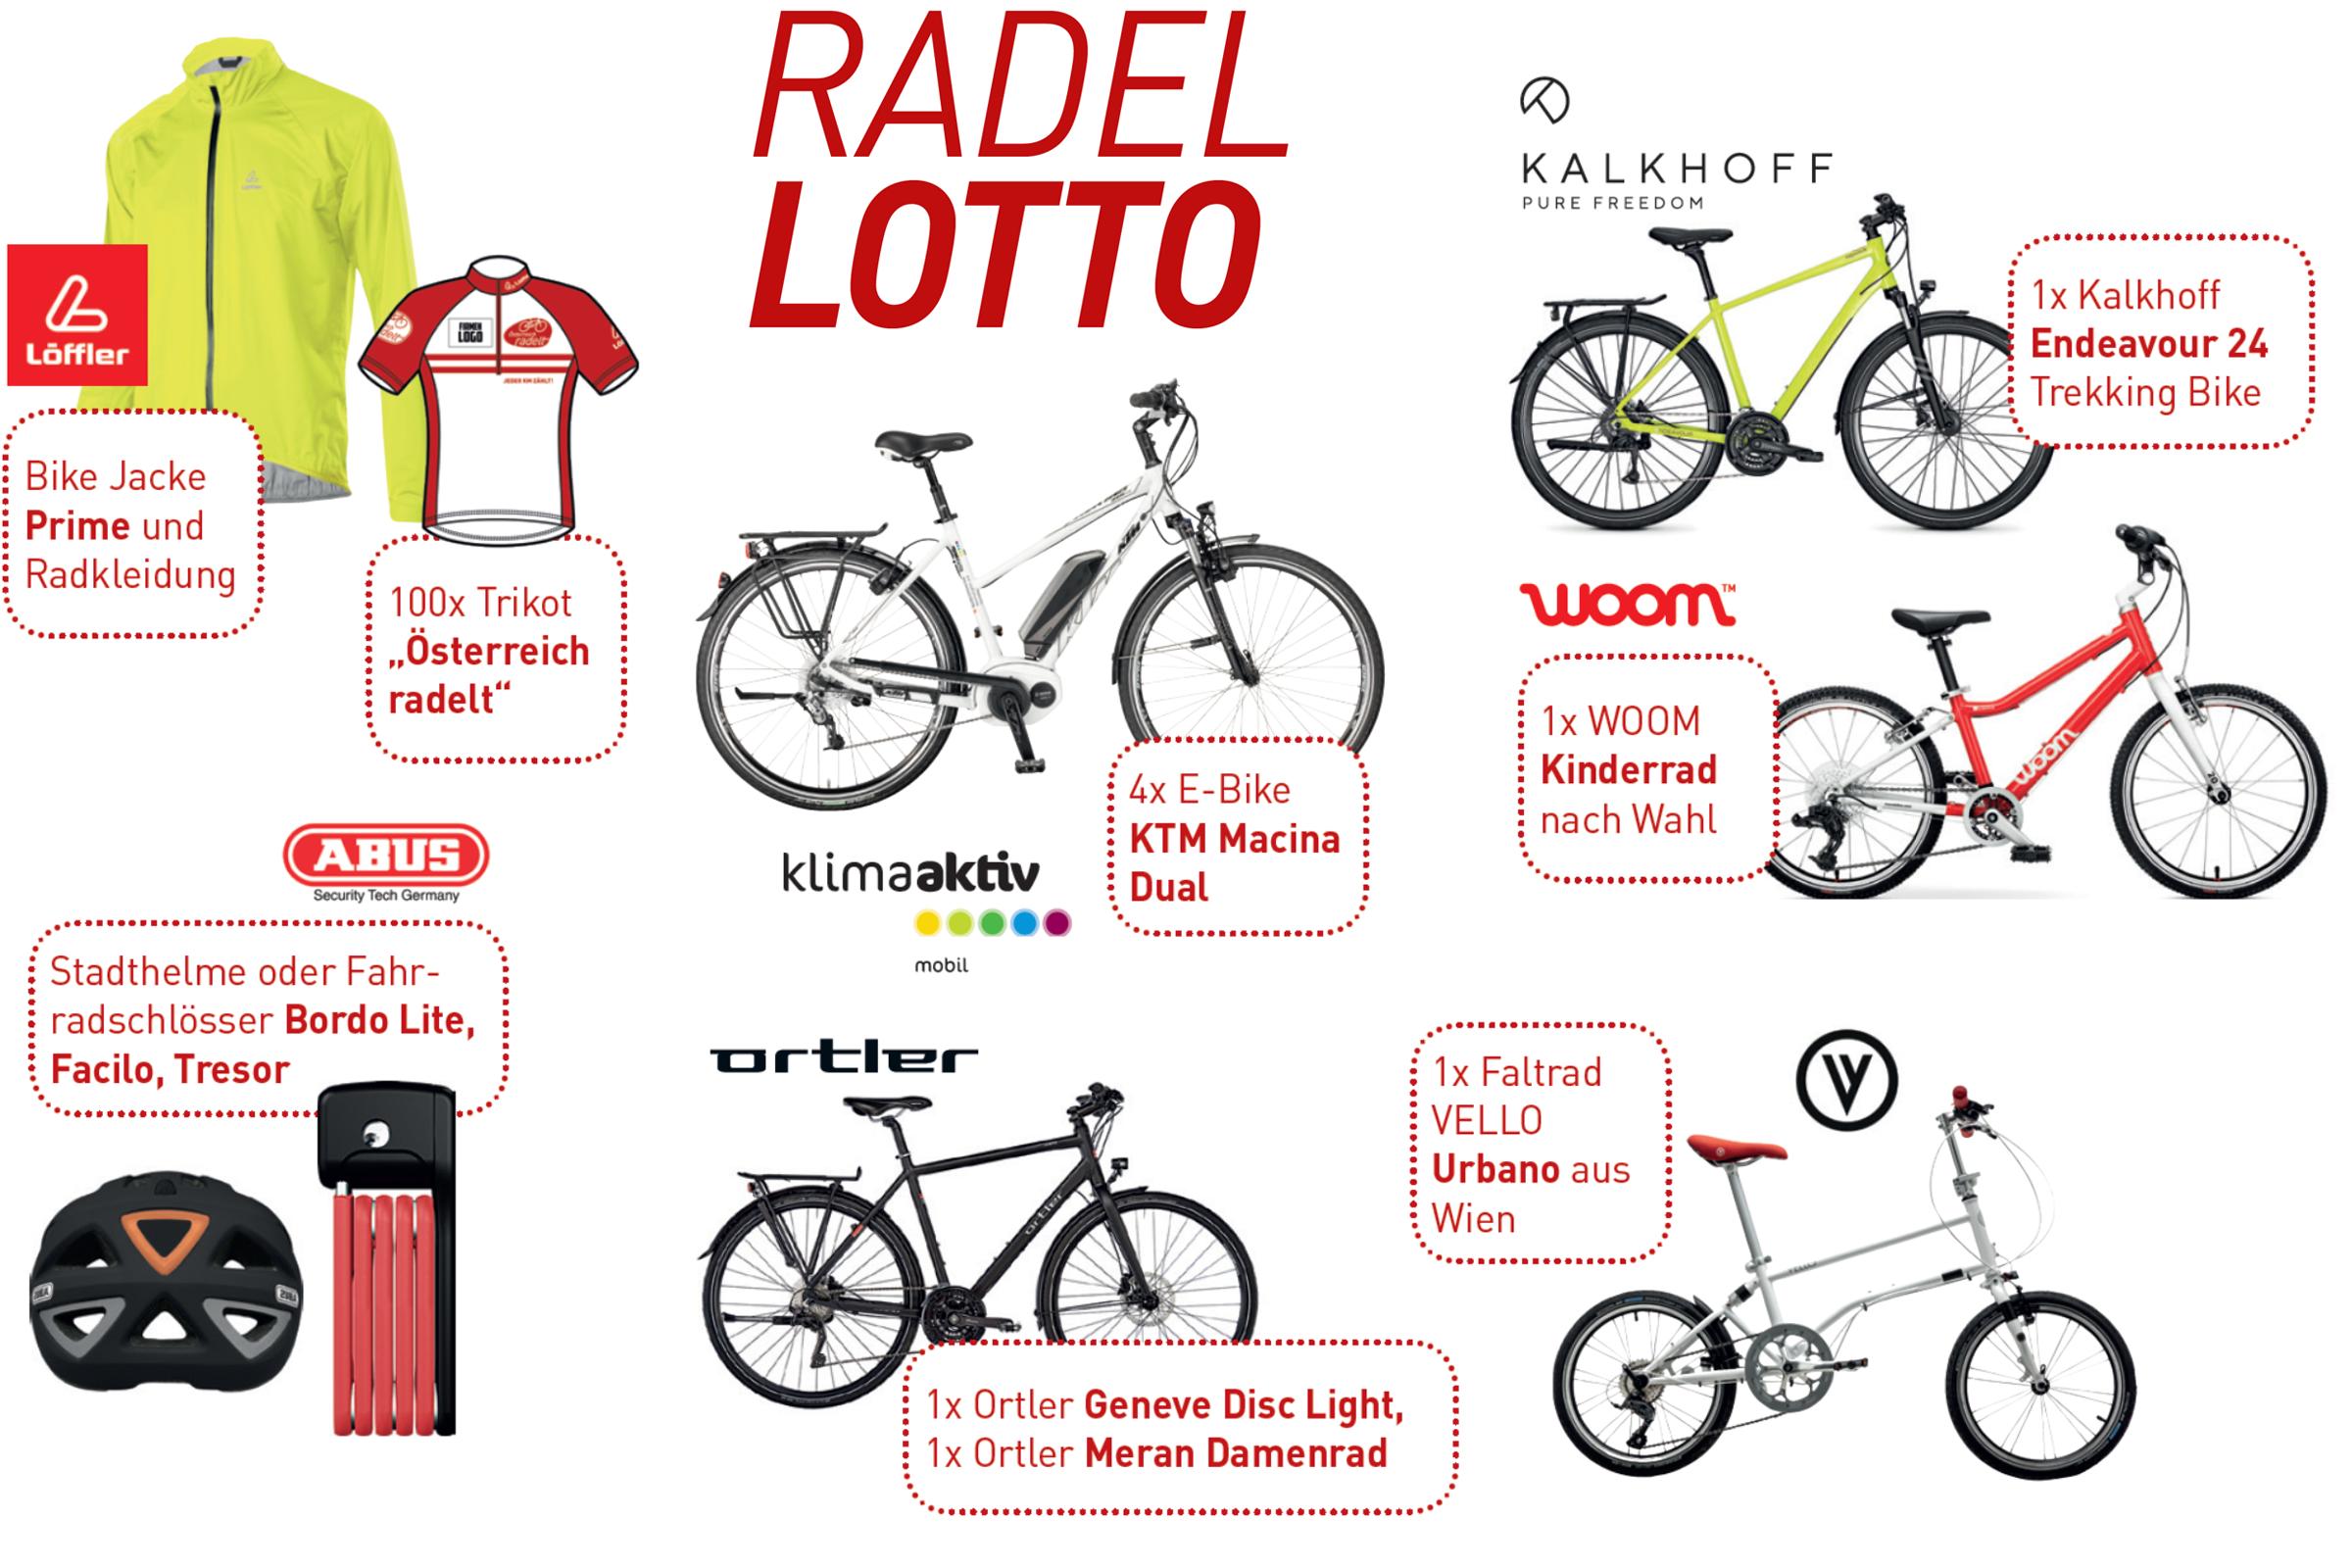 Radel-Lotto